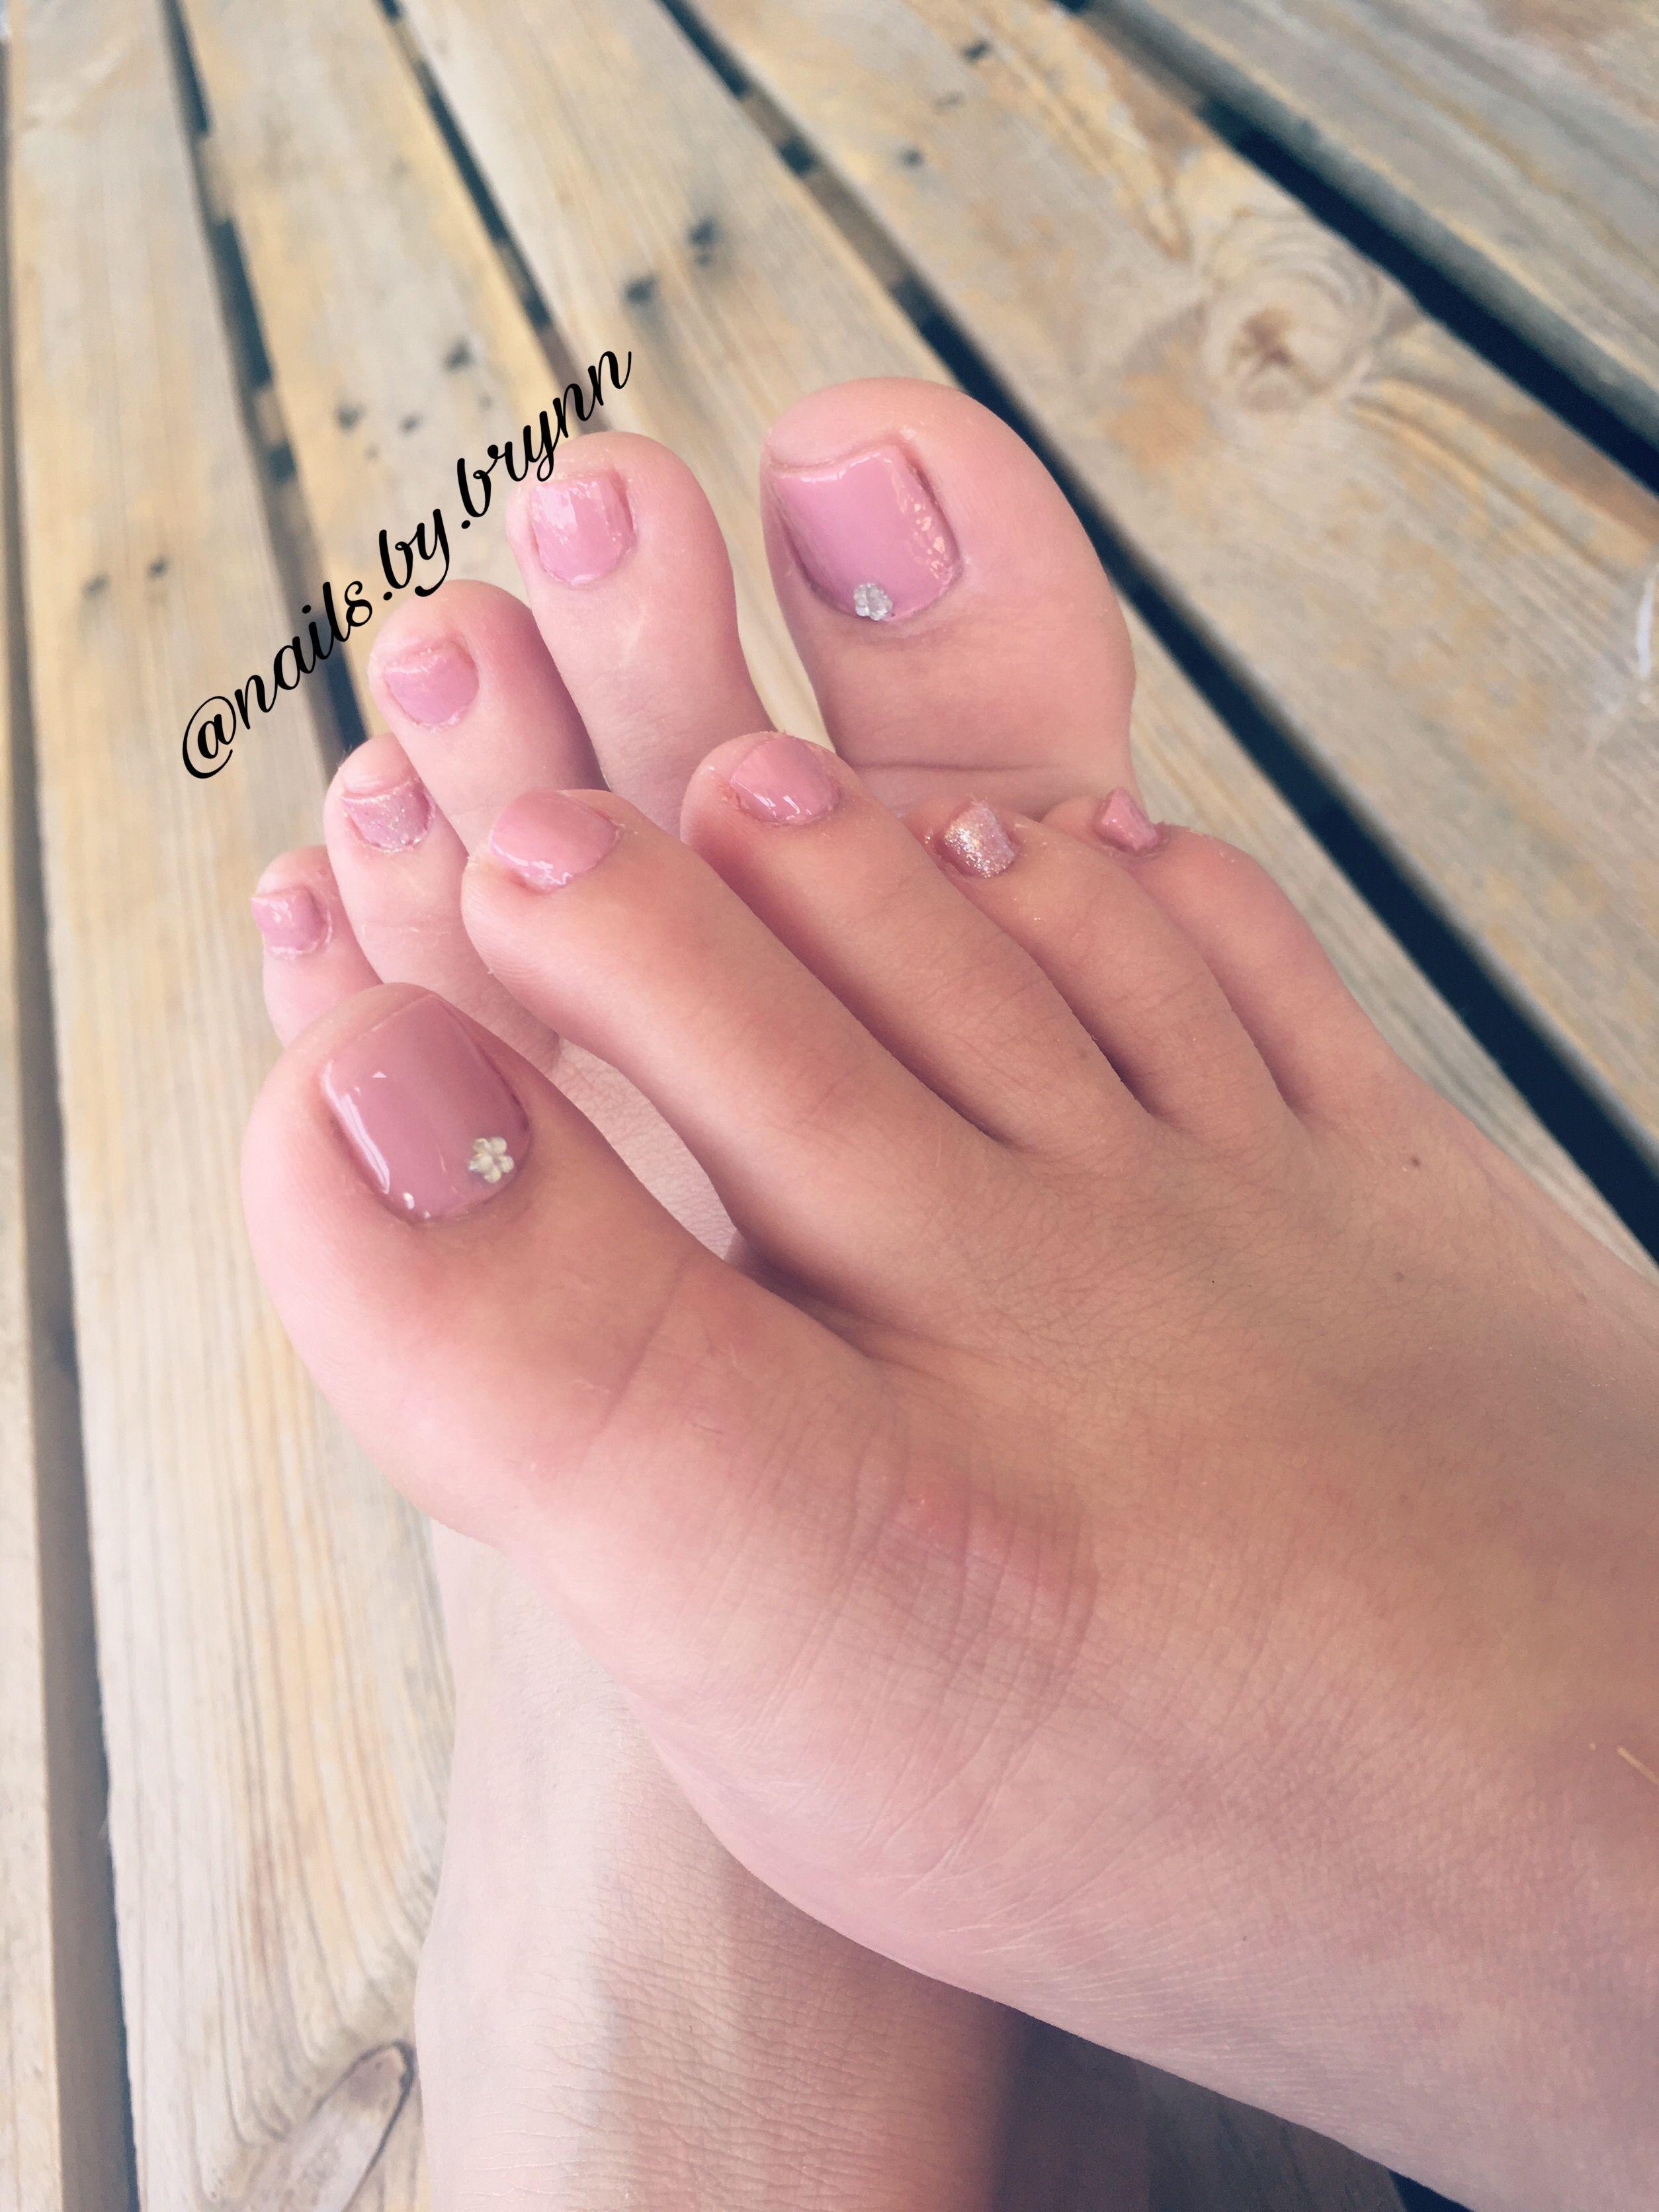 Light pink pedicure ignailsynn nails ideas pinterest